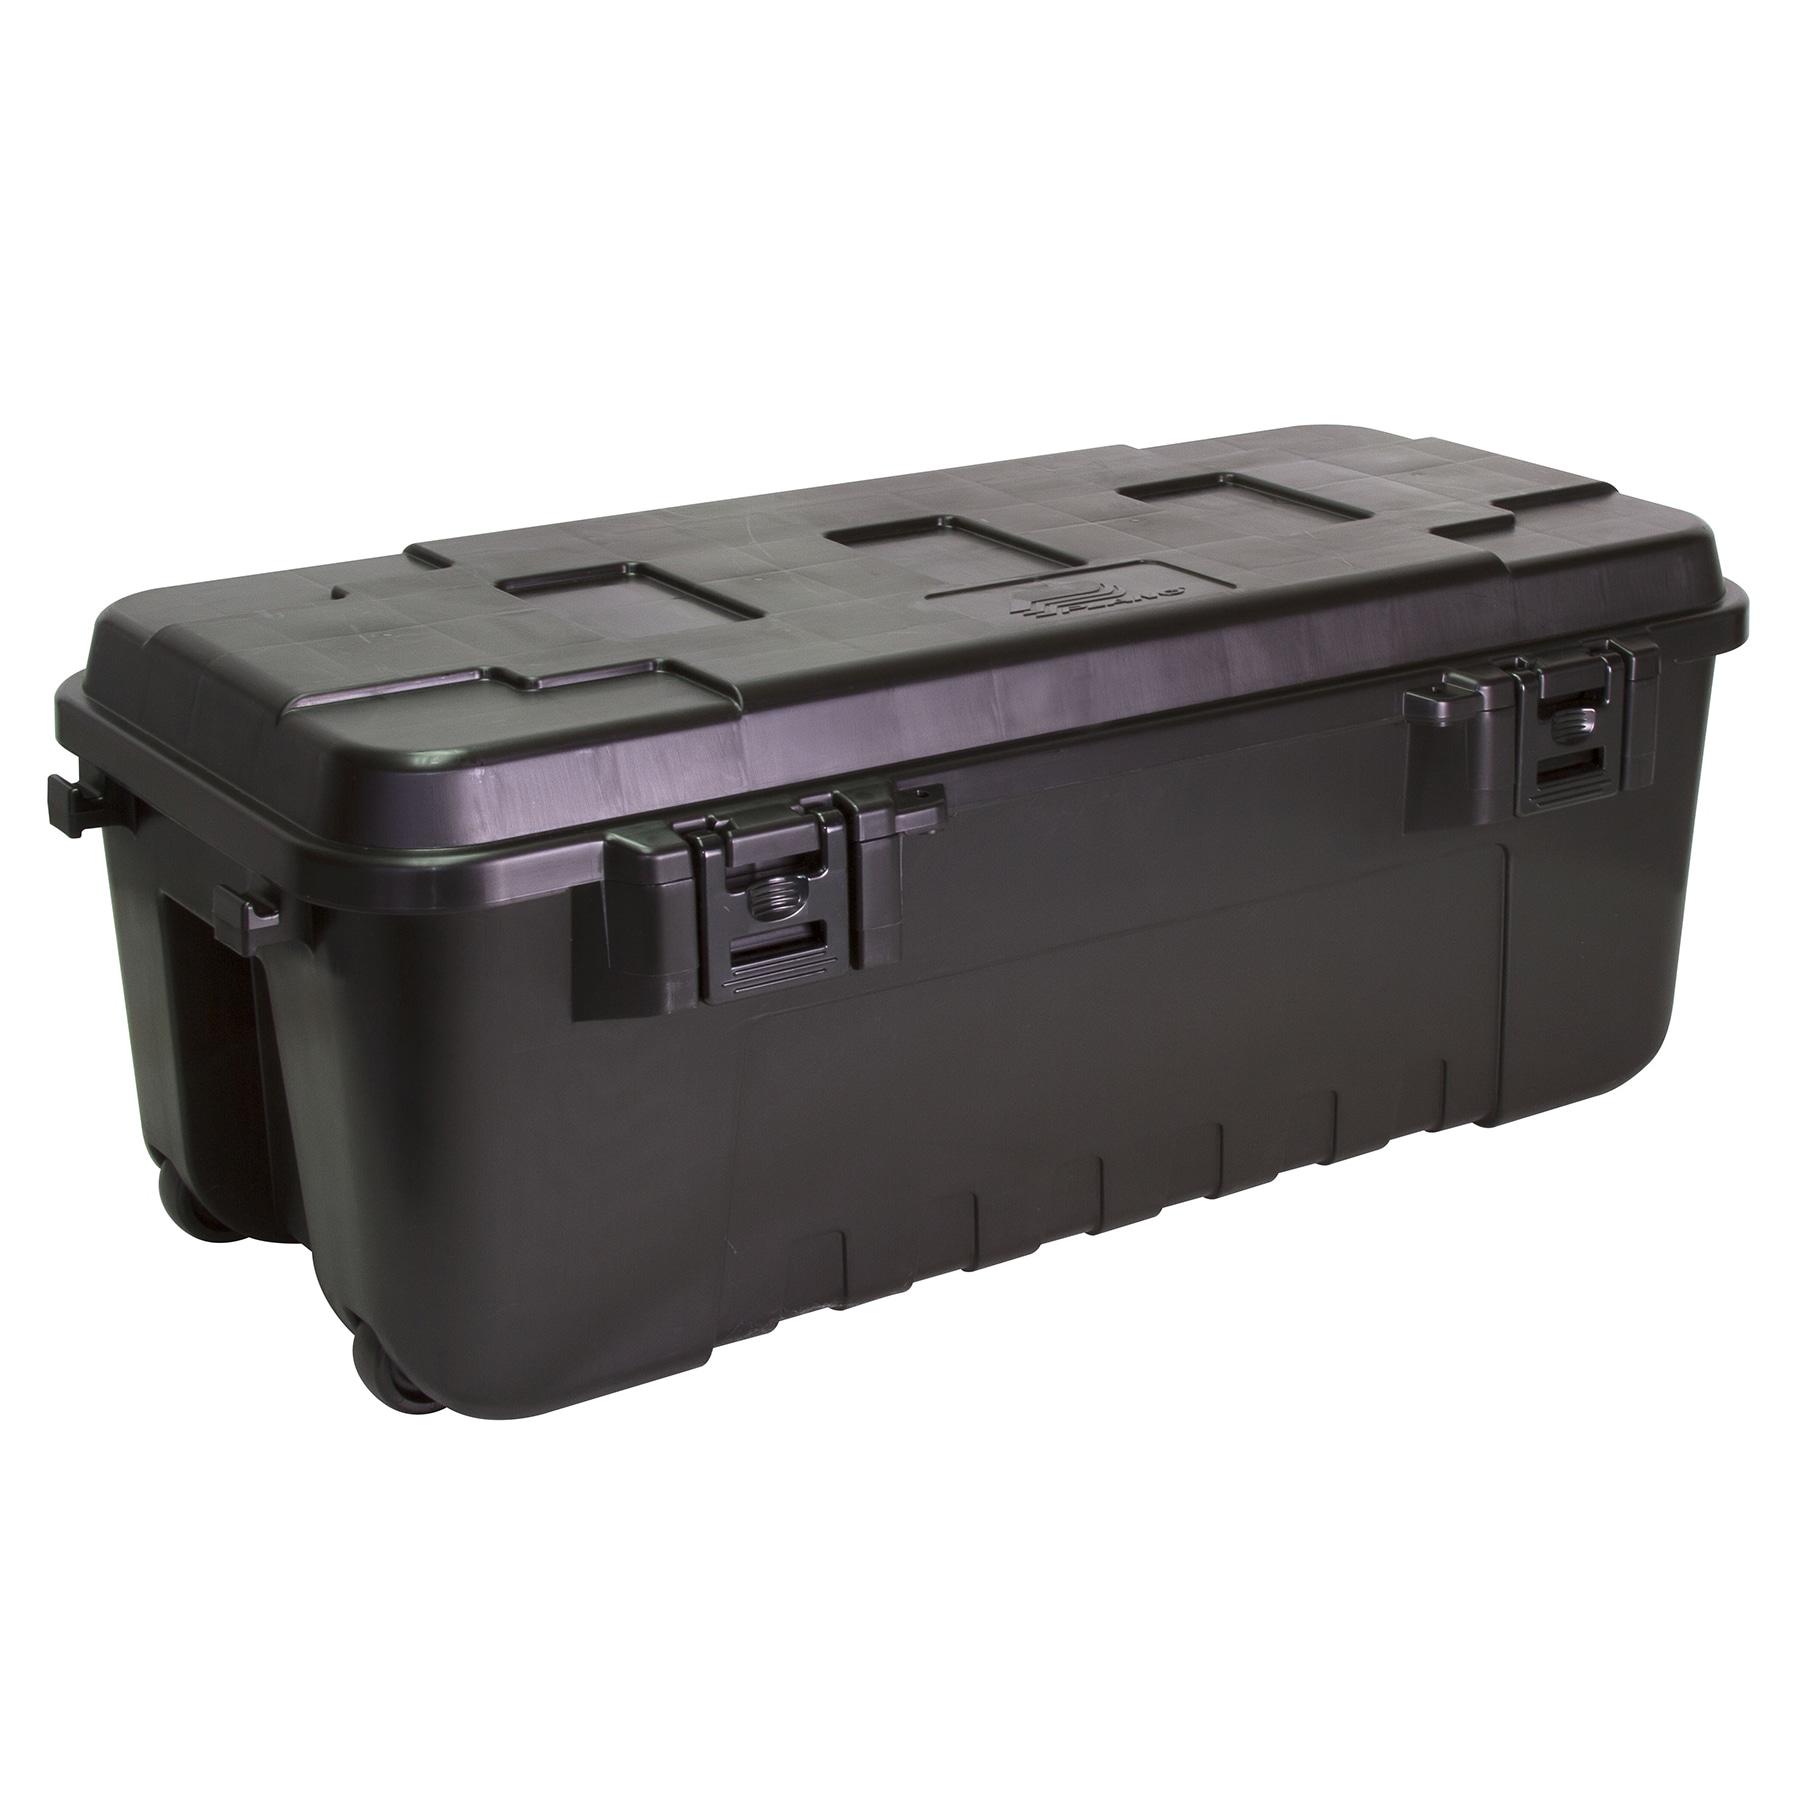 Plano 1919-00 108 Quart Black Storage Trunk (Other Storage)